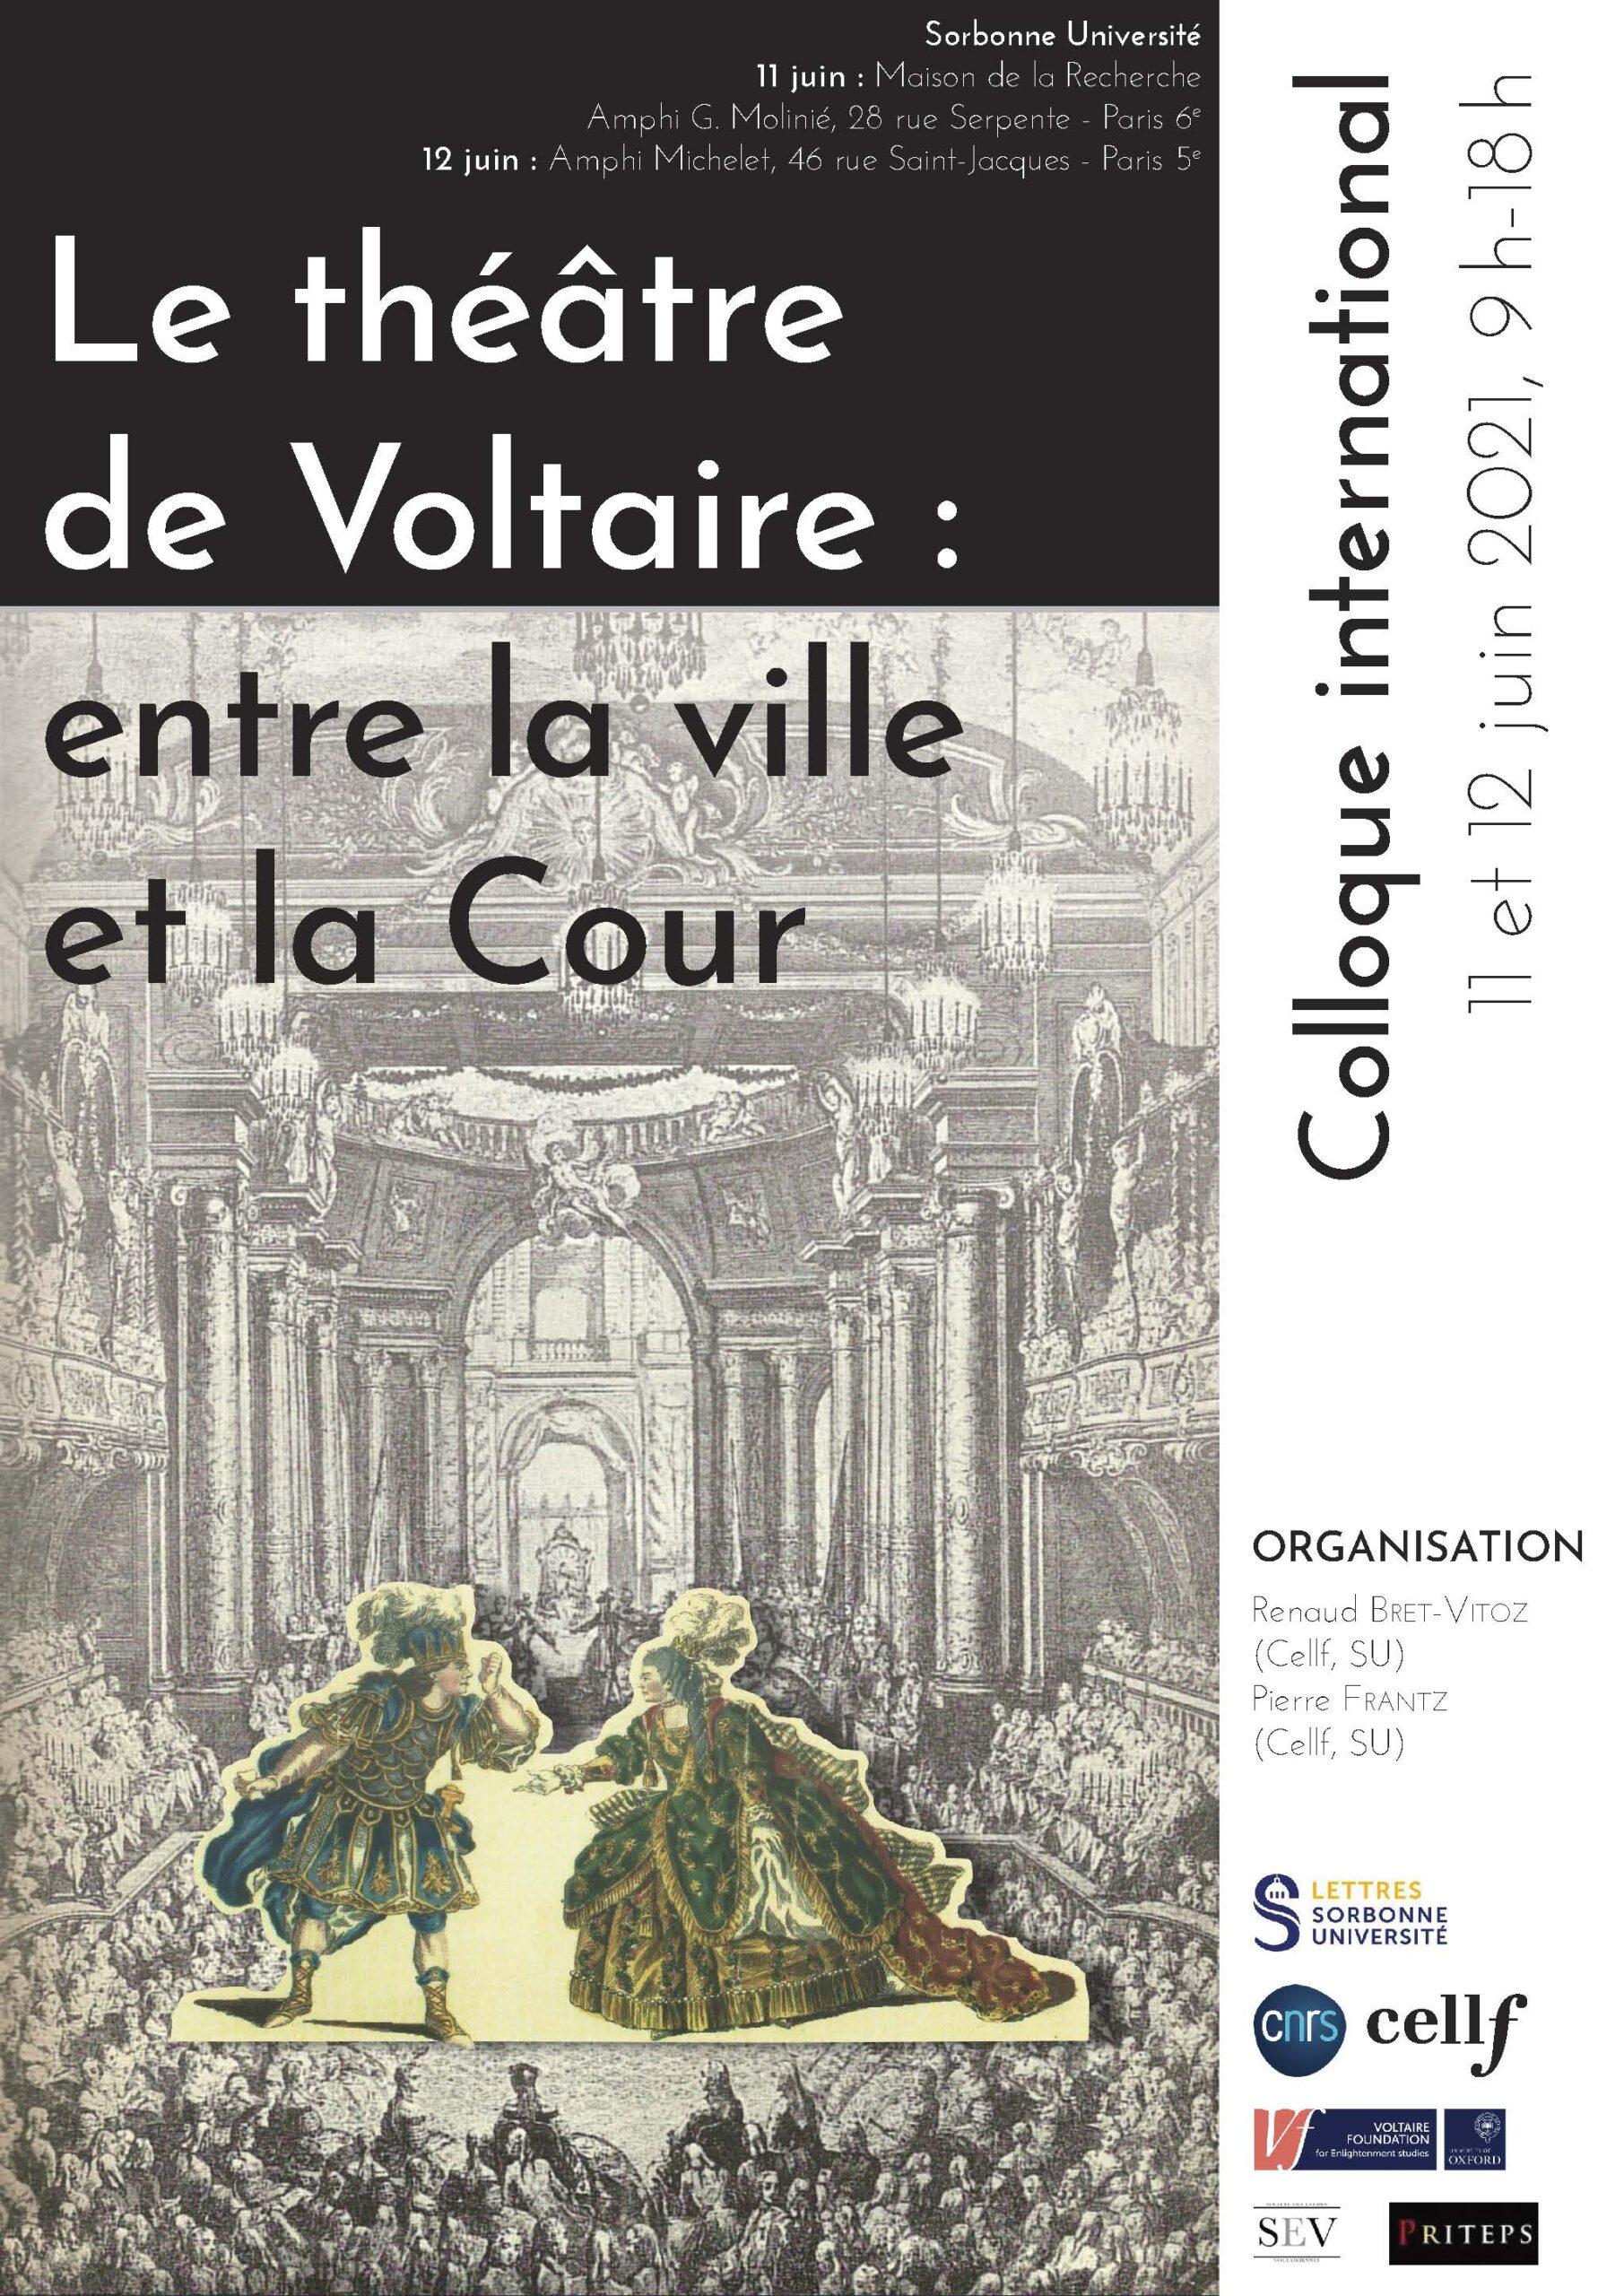 Affiche colloque Voltaire